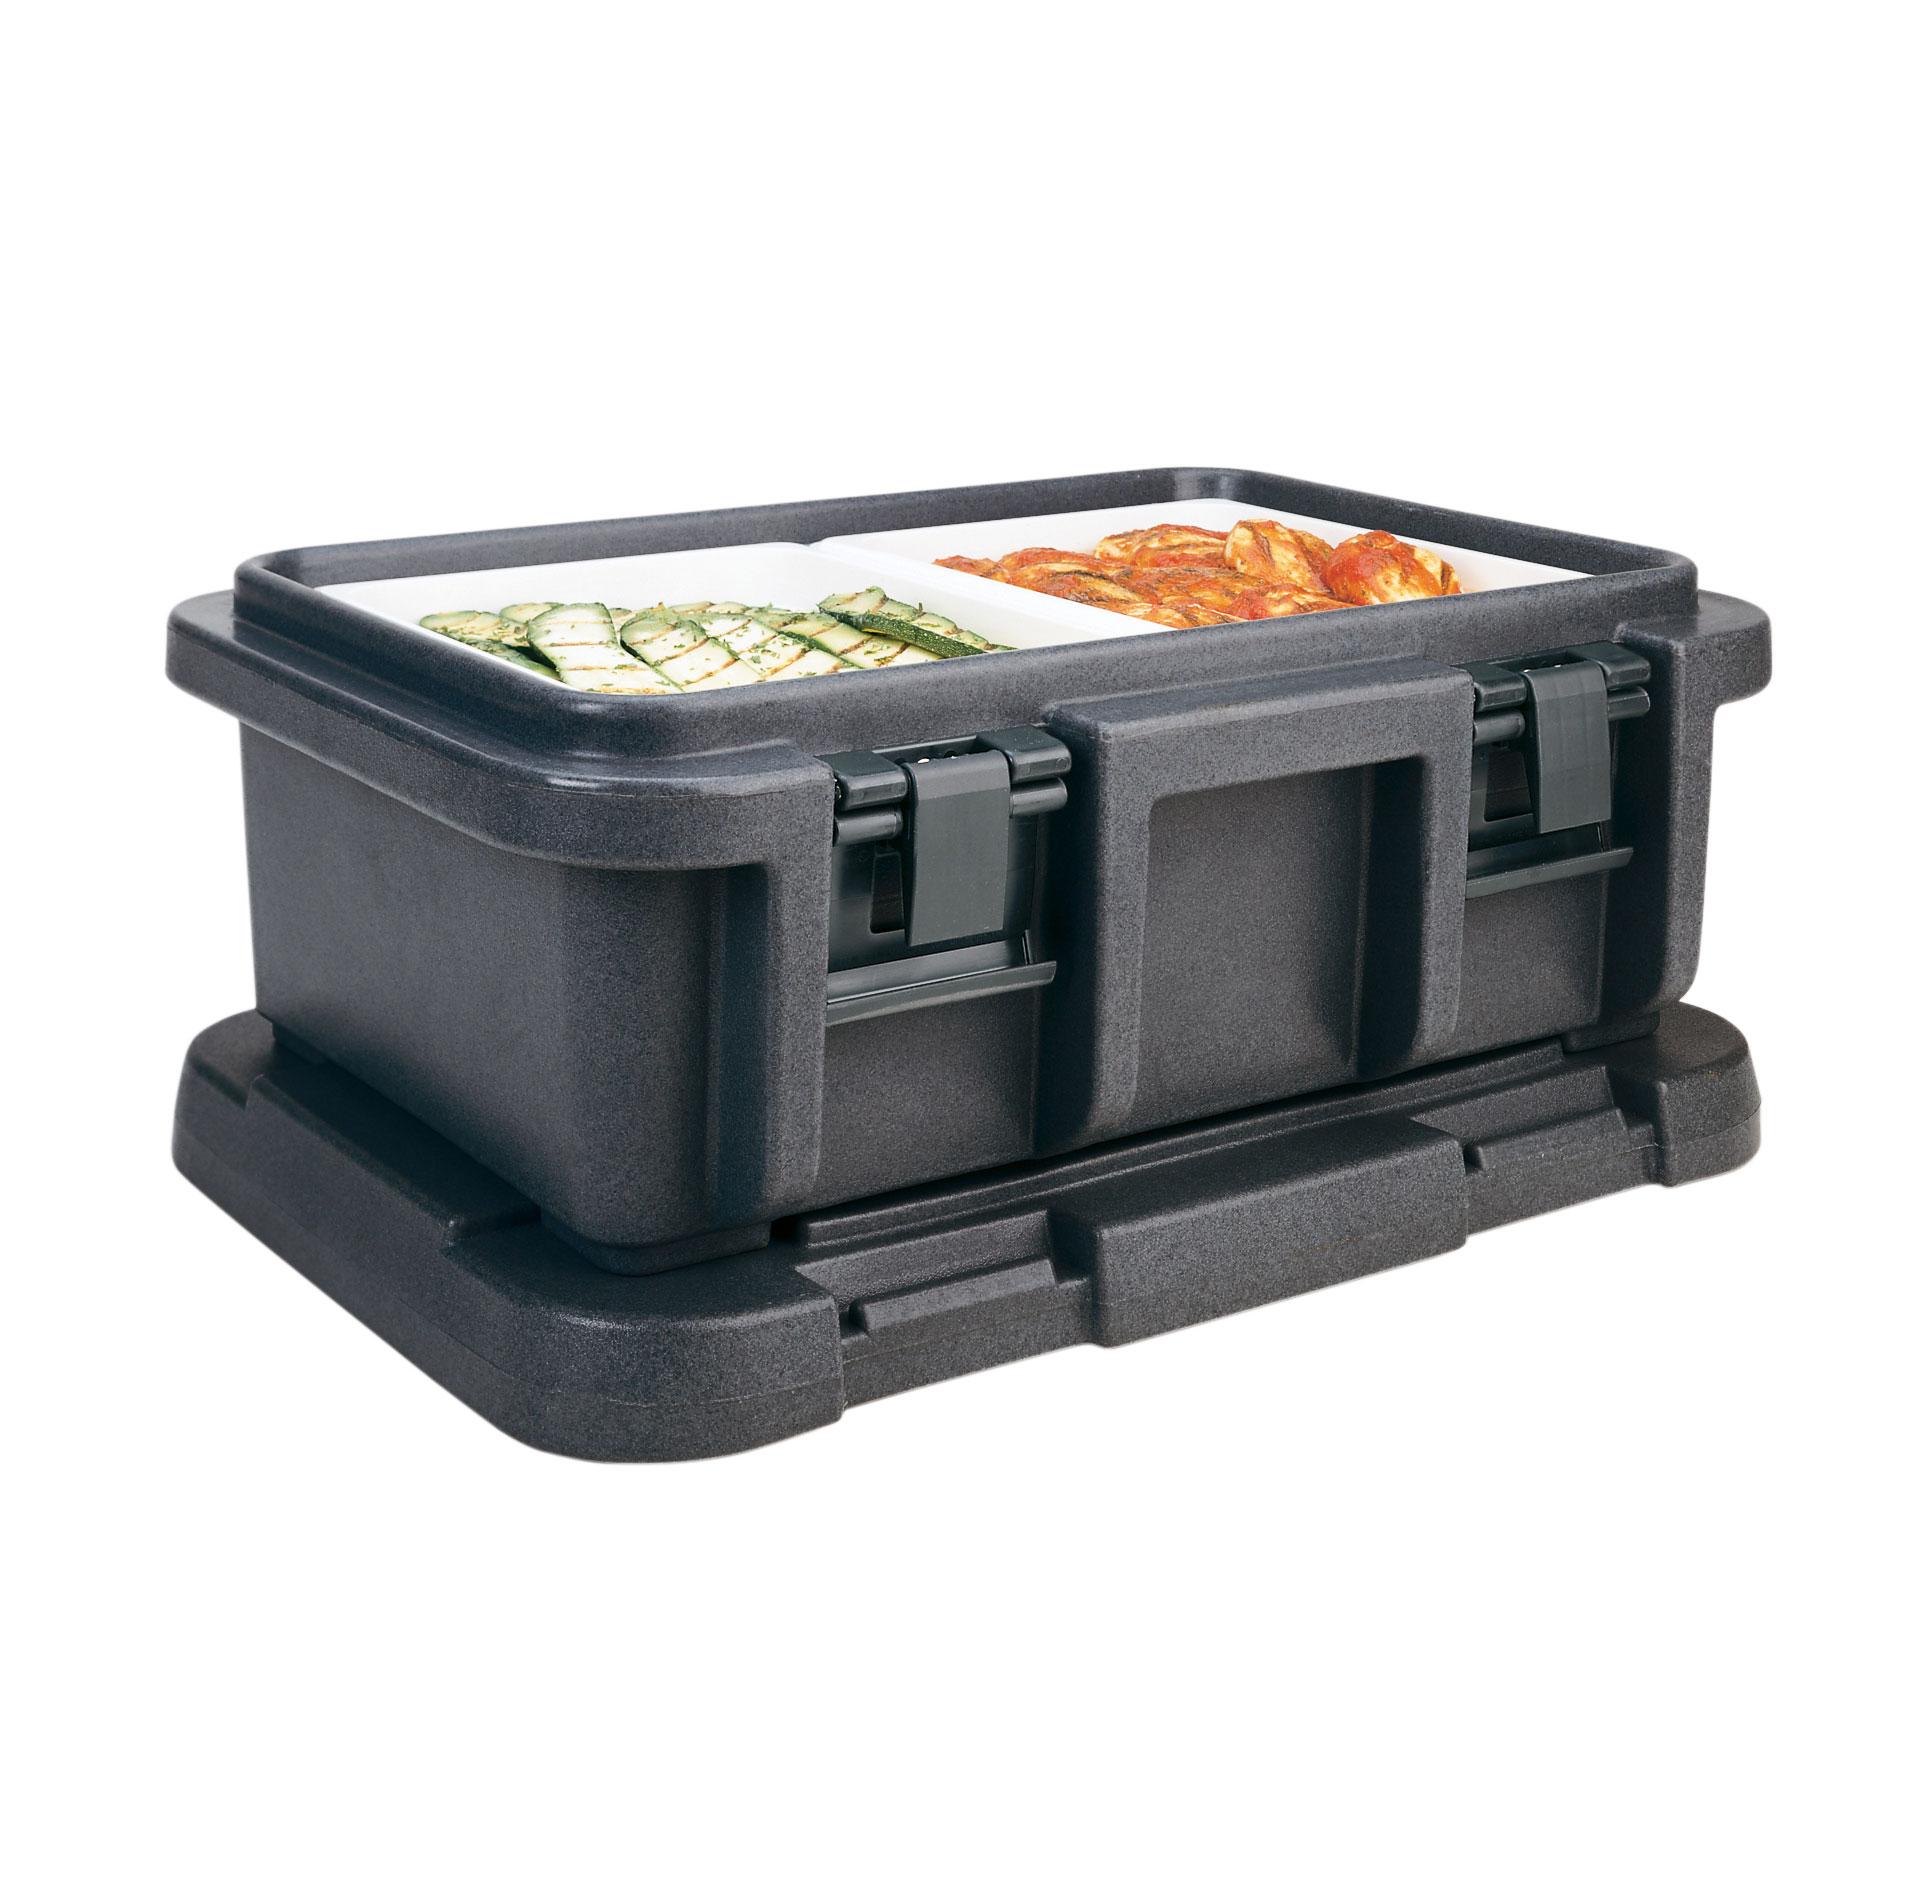 Cambro UPC160110 food pan carriers